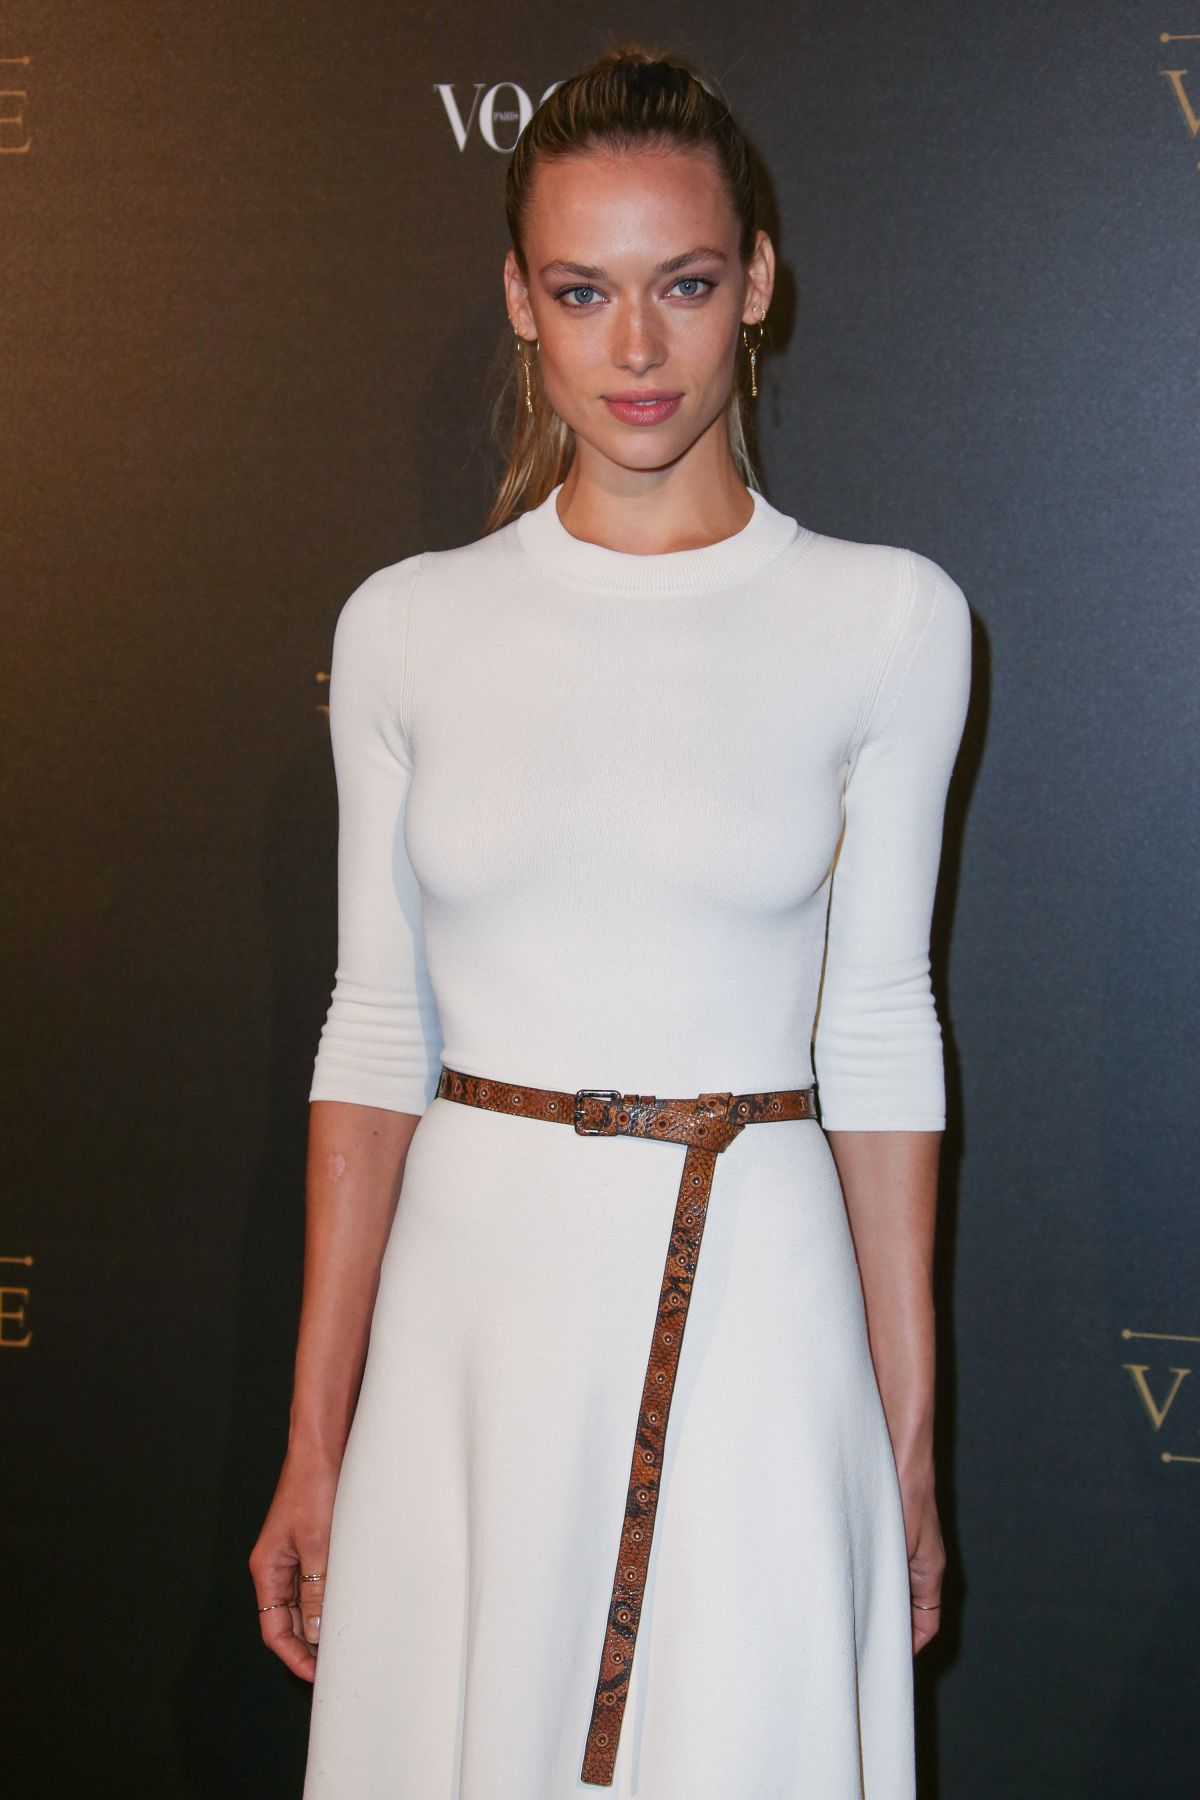 Hannah Ferguson at Vogue X Irving Penn Party during Paris Fashion Week, France